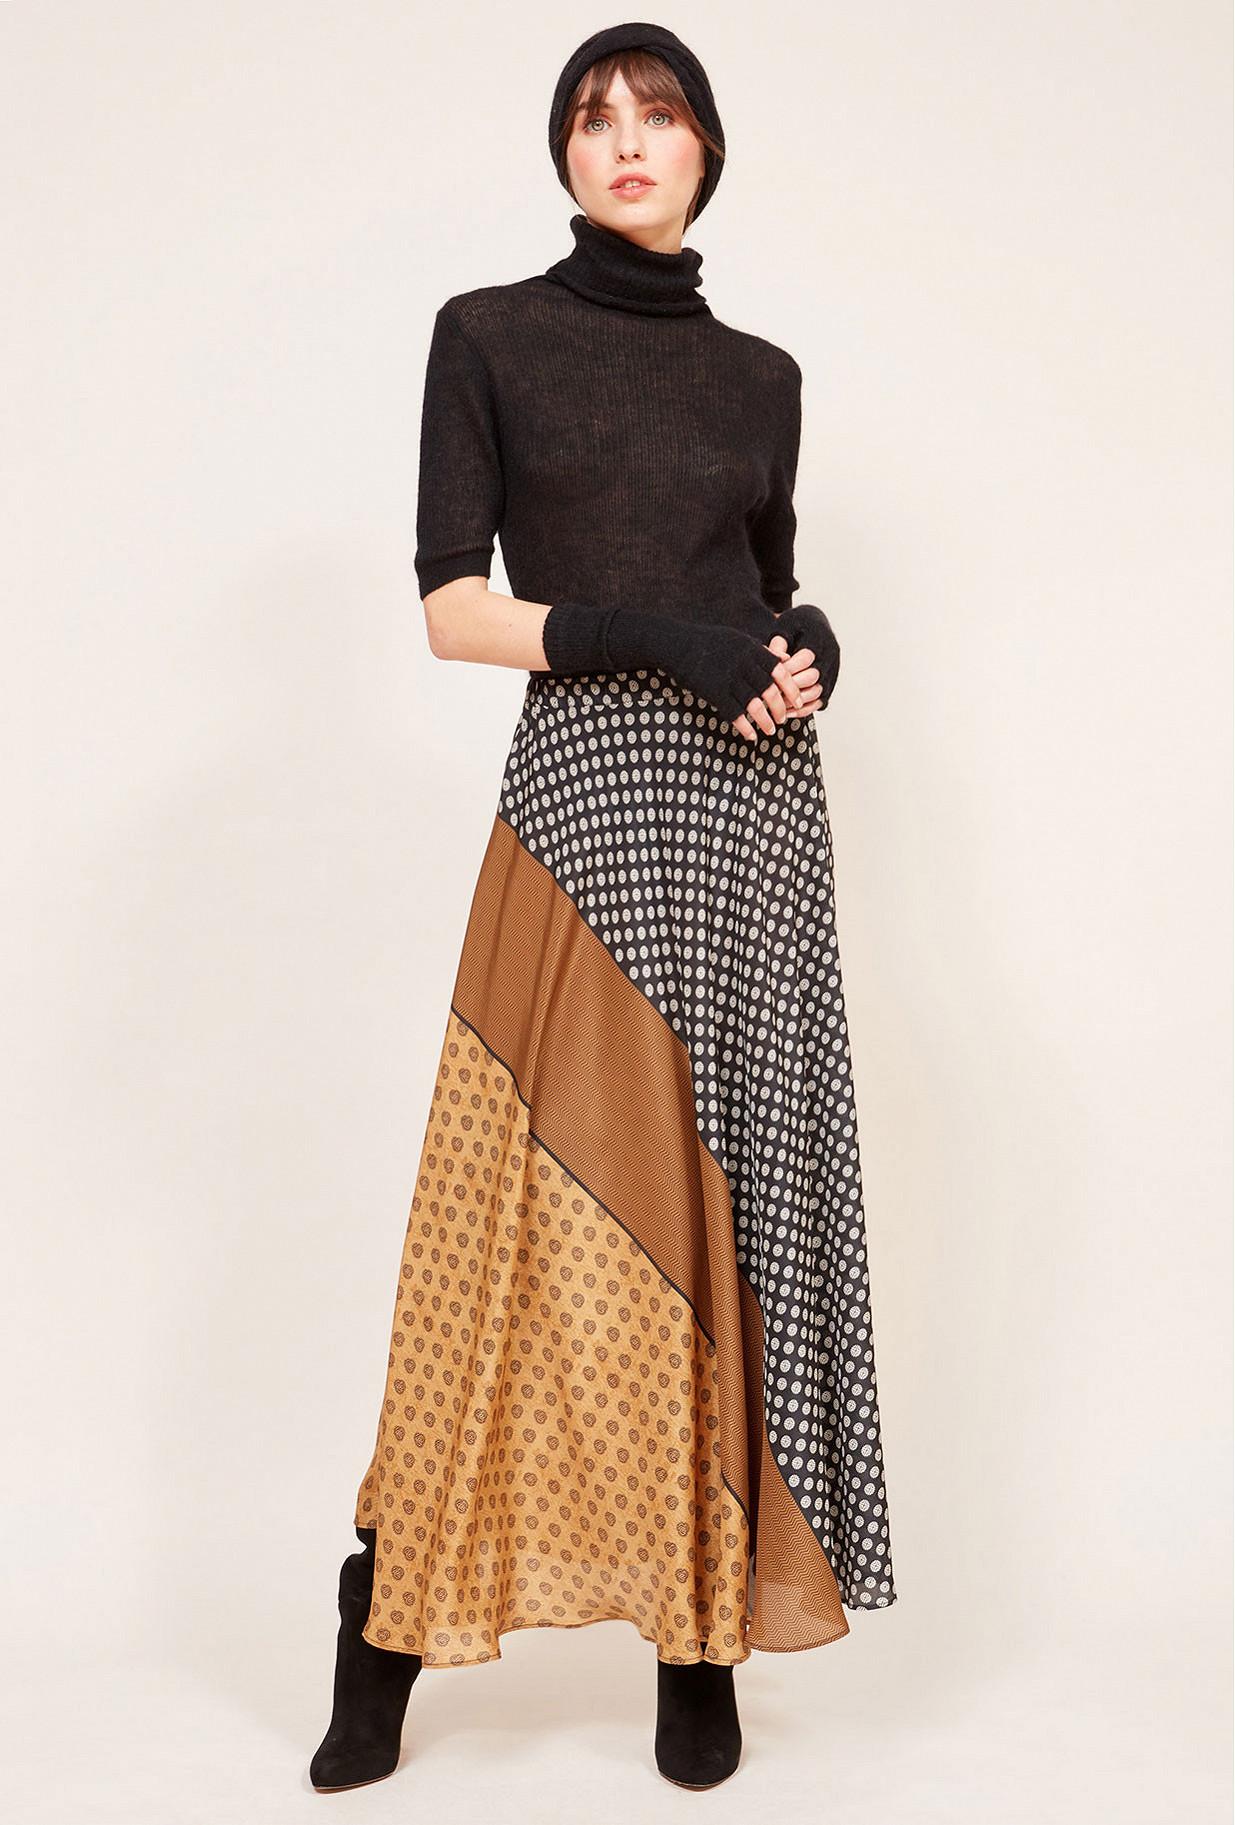 Paris clothes store Skirt  Brakid french designer fashion Paris